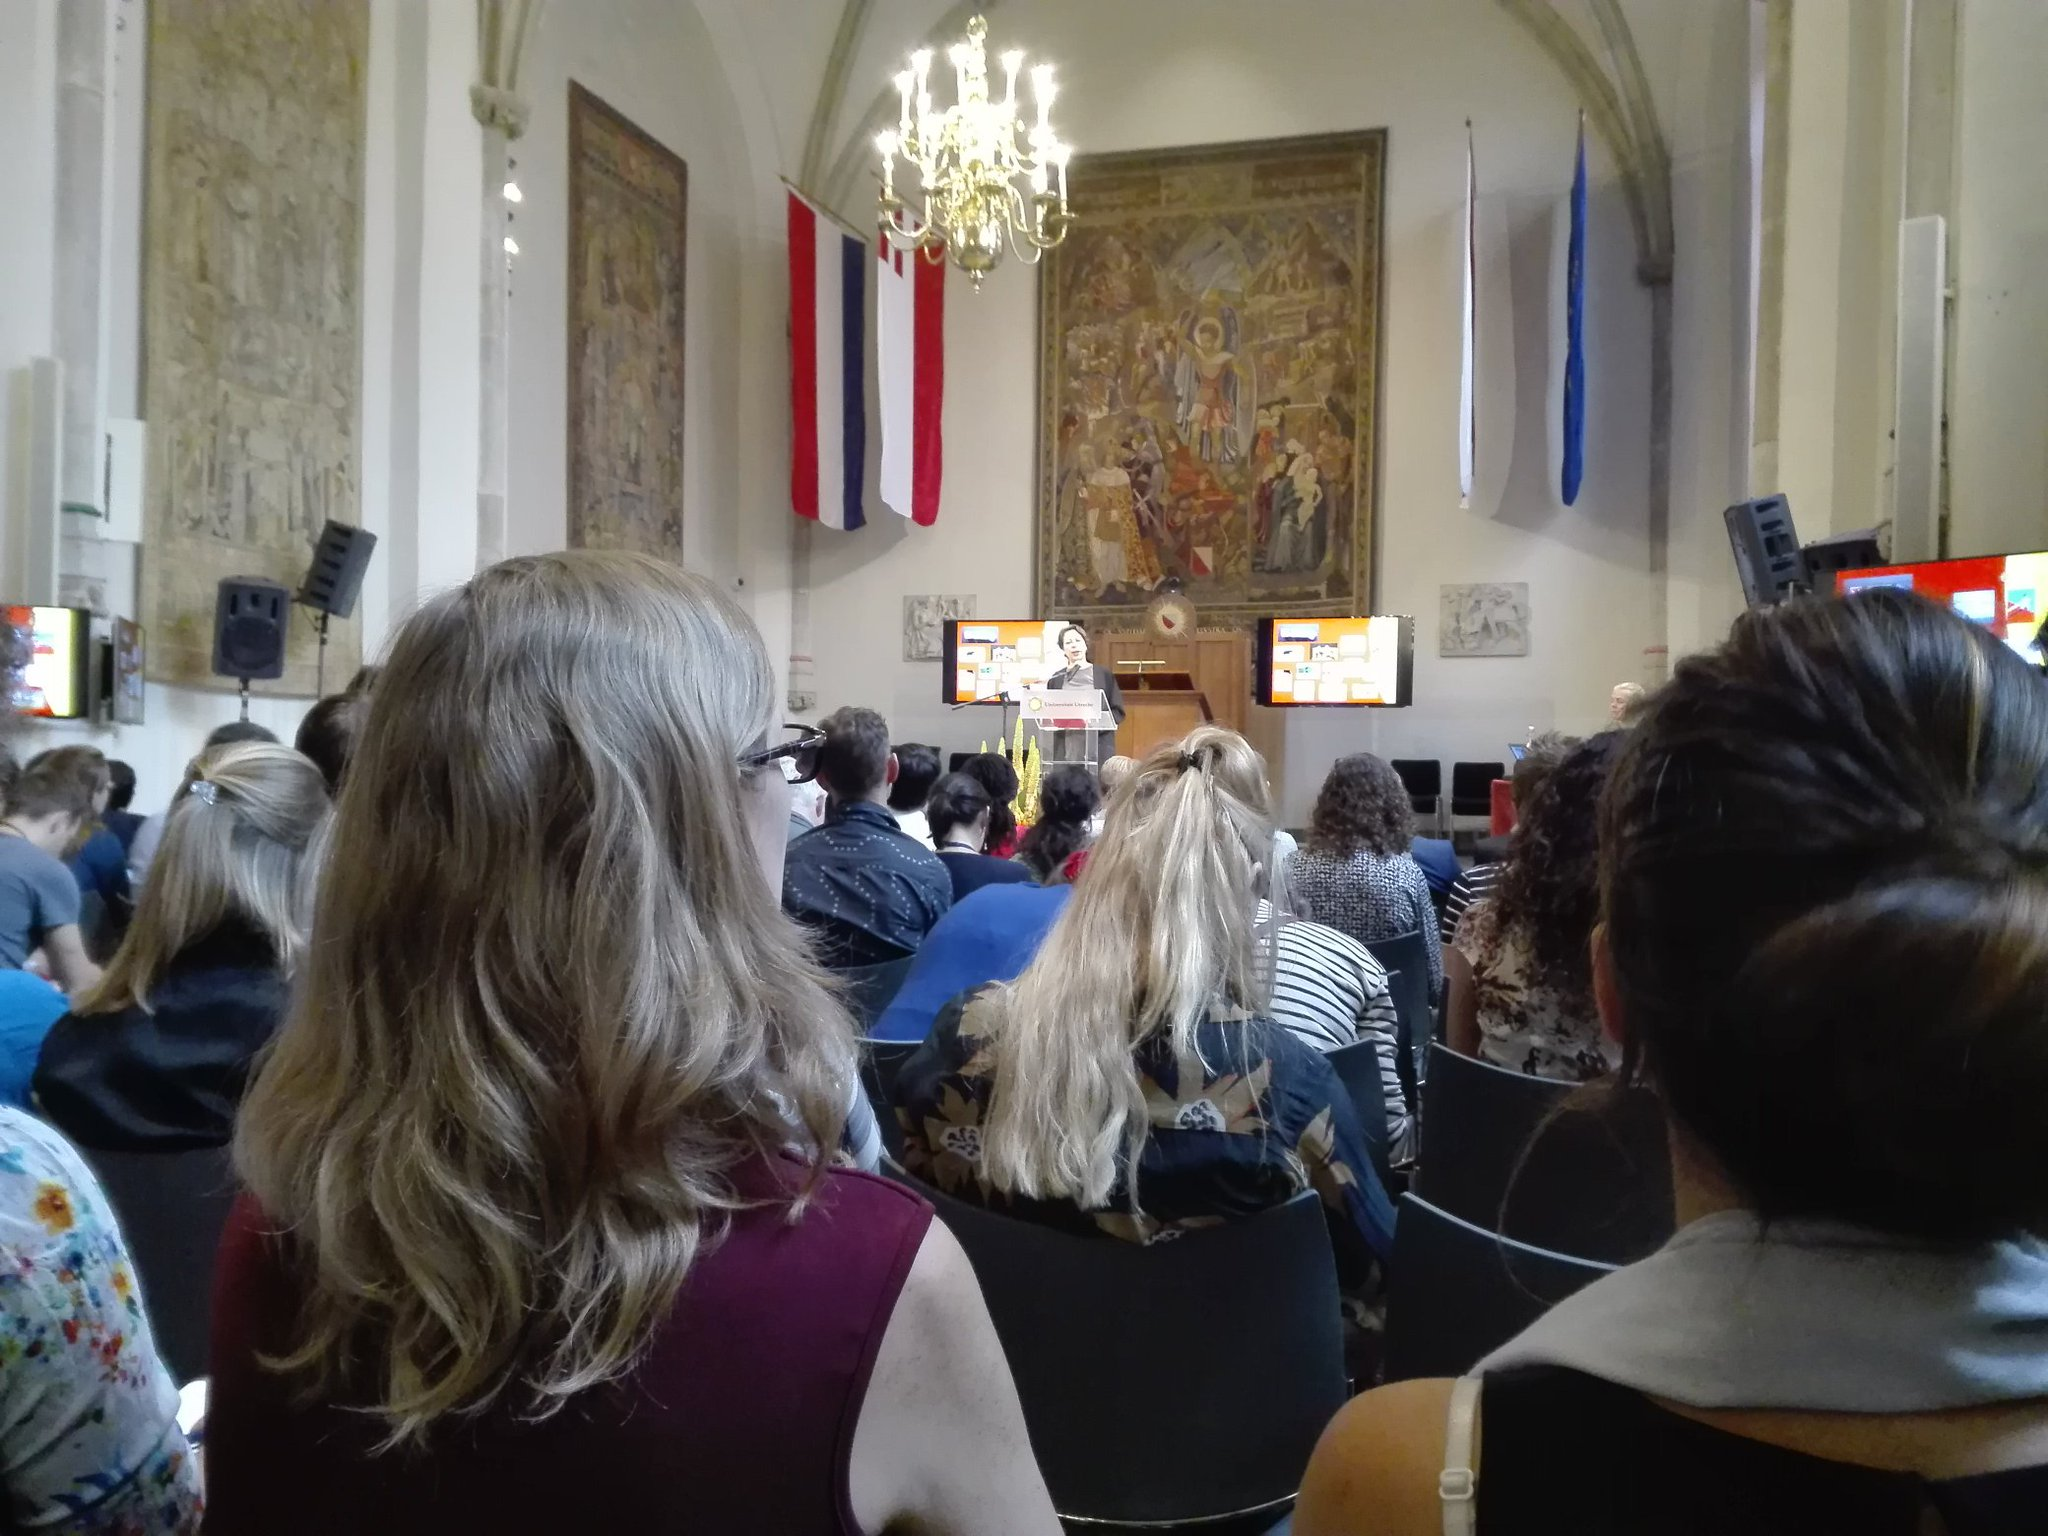 Professor Denise de Ridder opening WINK the nudge conference #NUDGE2017 https://t.co/fbKf1MWNVE